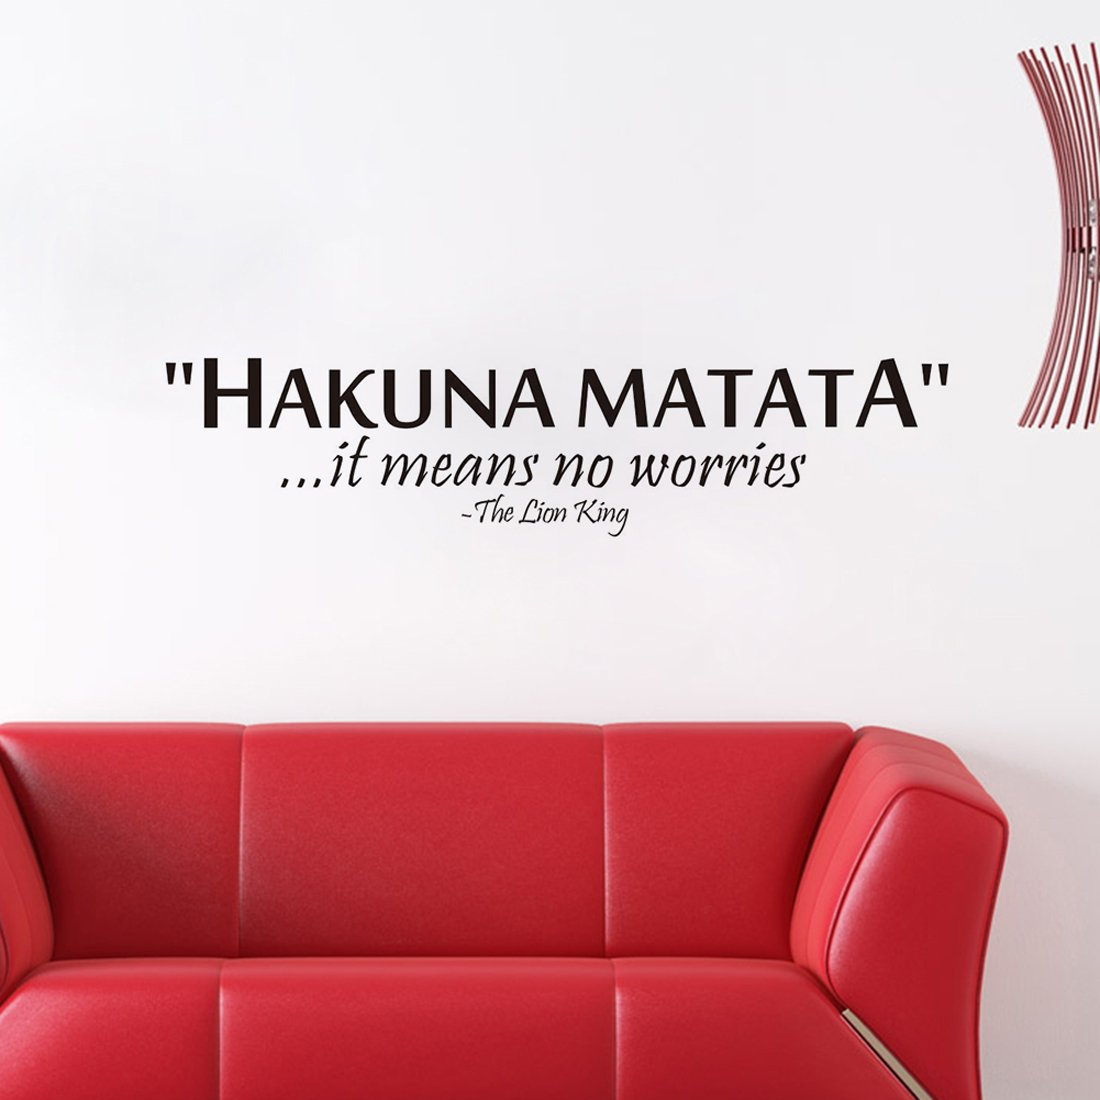 filosofische spreuken geluk Praktische Spreuken muurstickers HAKUNA MATATA Geluk Filosofie  filosofische spreuken geluk